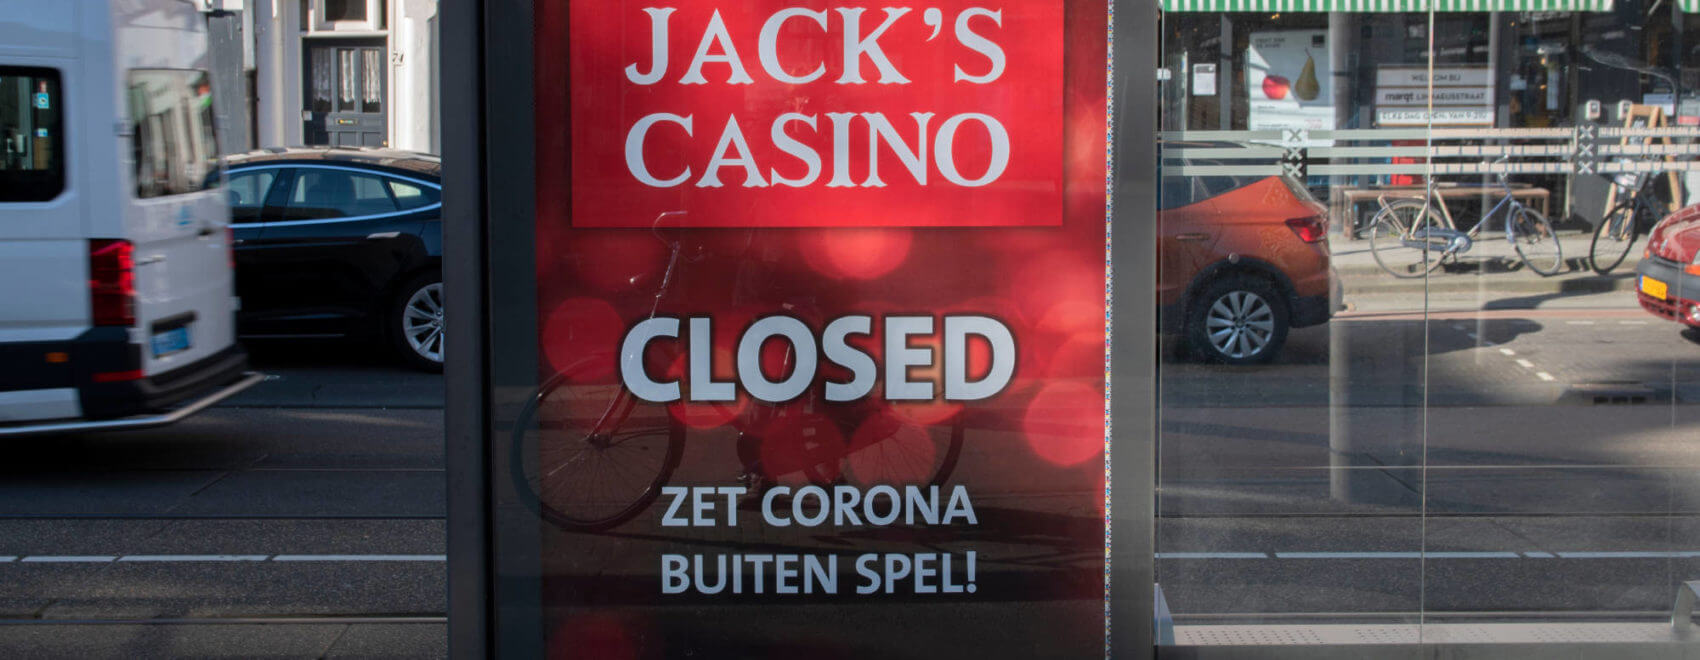 Jacks Casino Corona poster